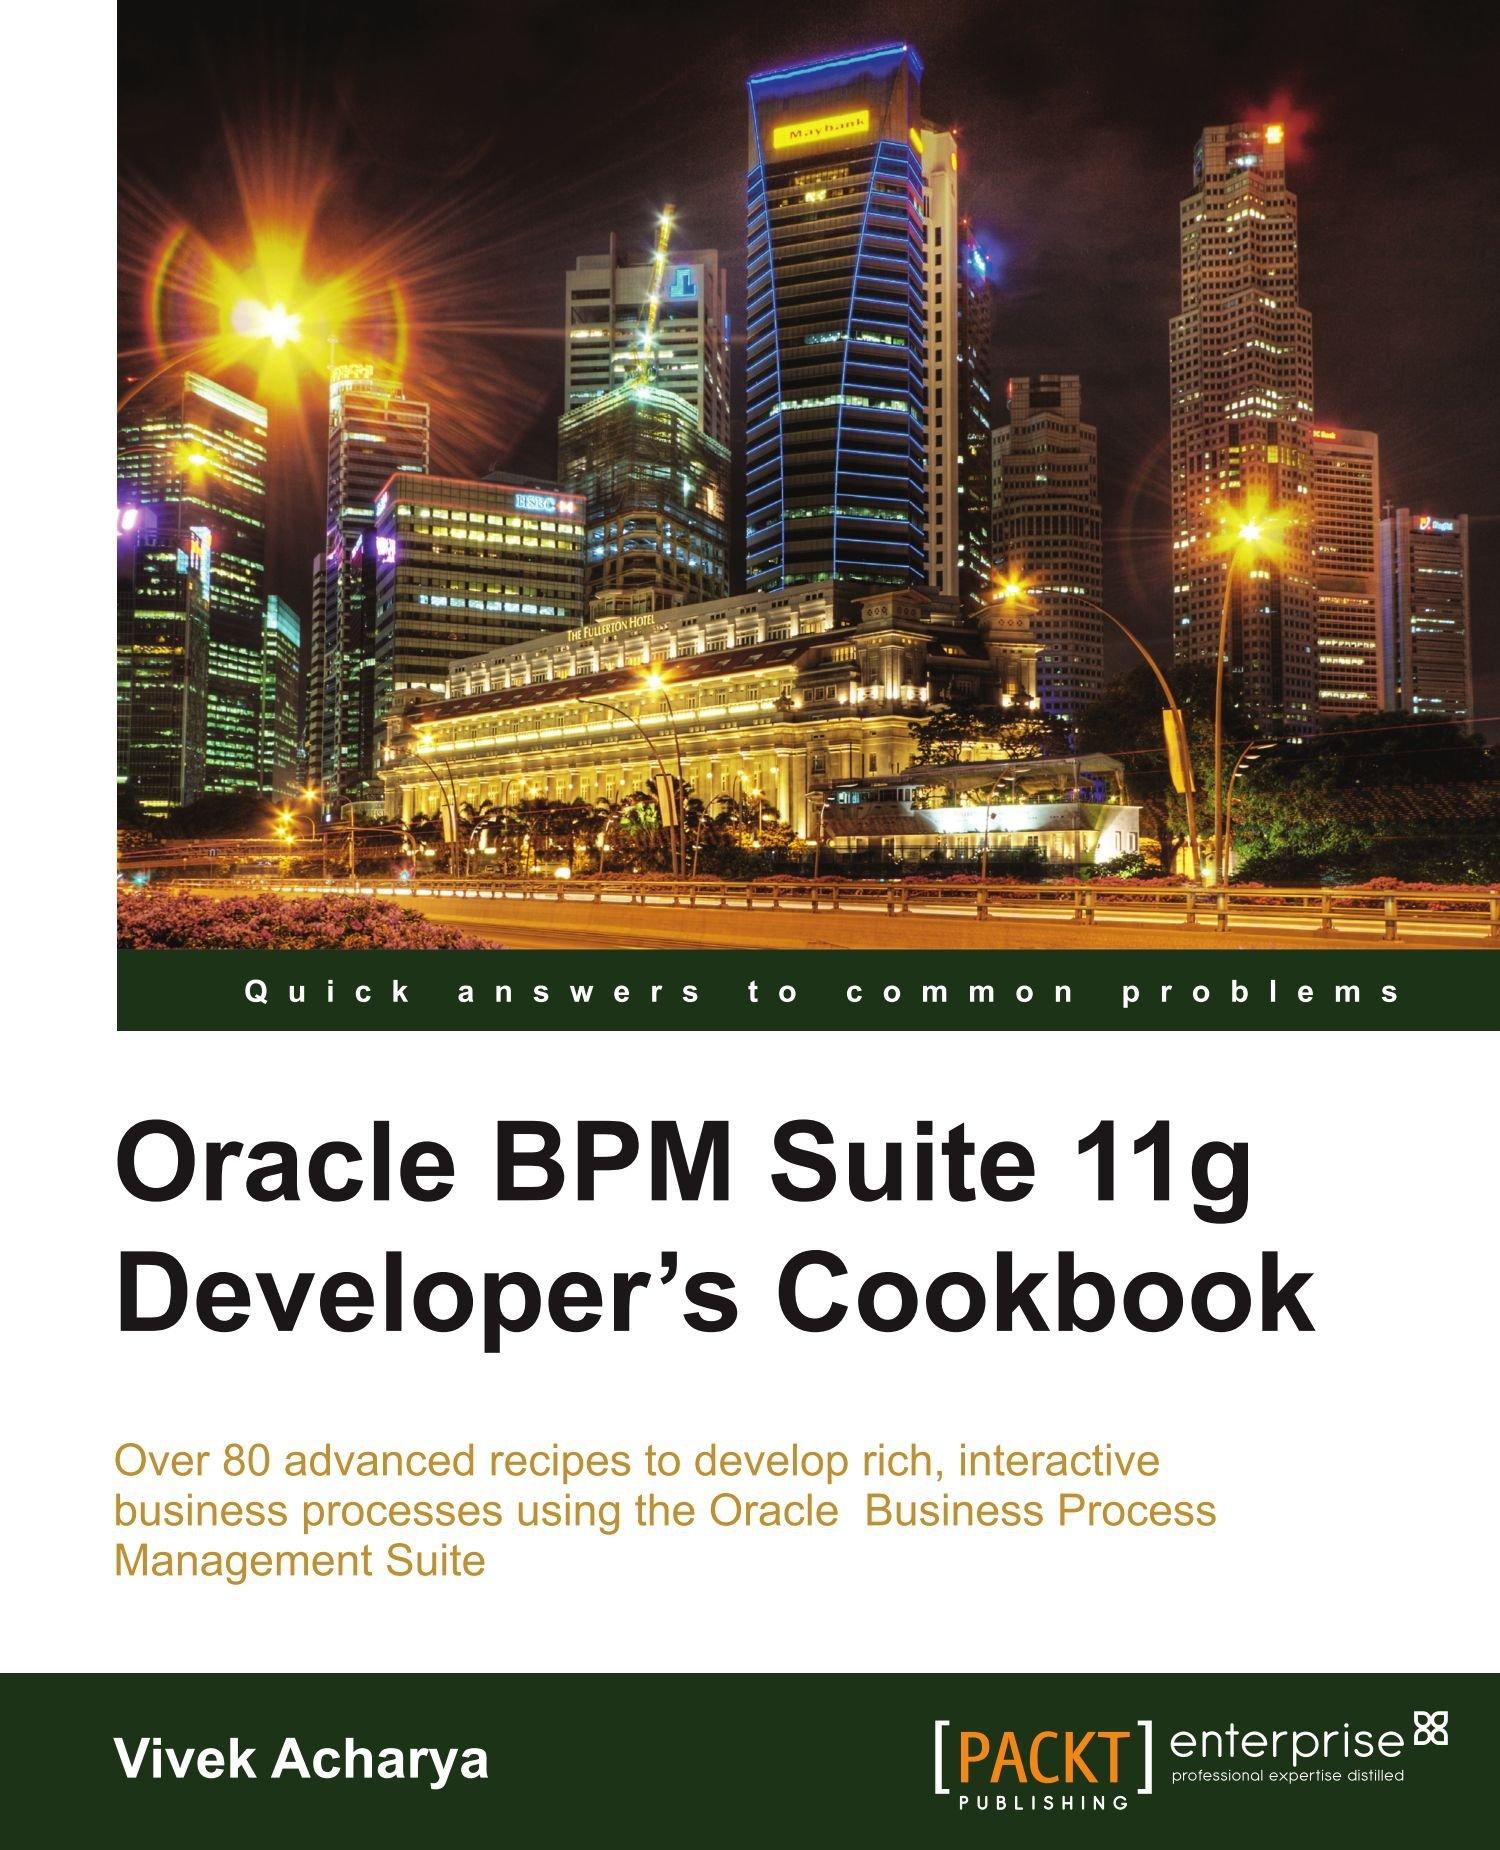 Oracle Bpm Suite 11g Developer's Cookbook: Vivek Acharya: 9781849684224:  Amazon: Books